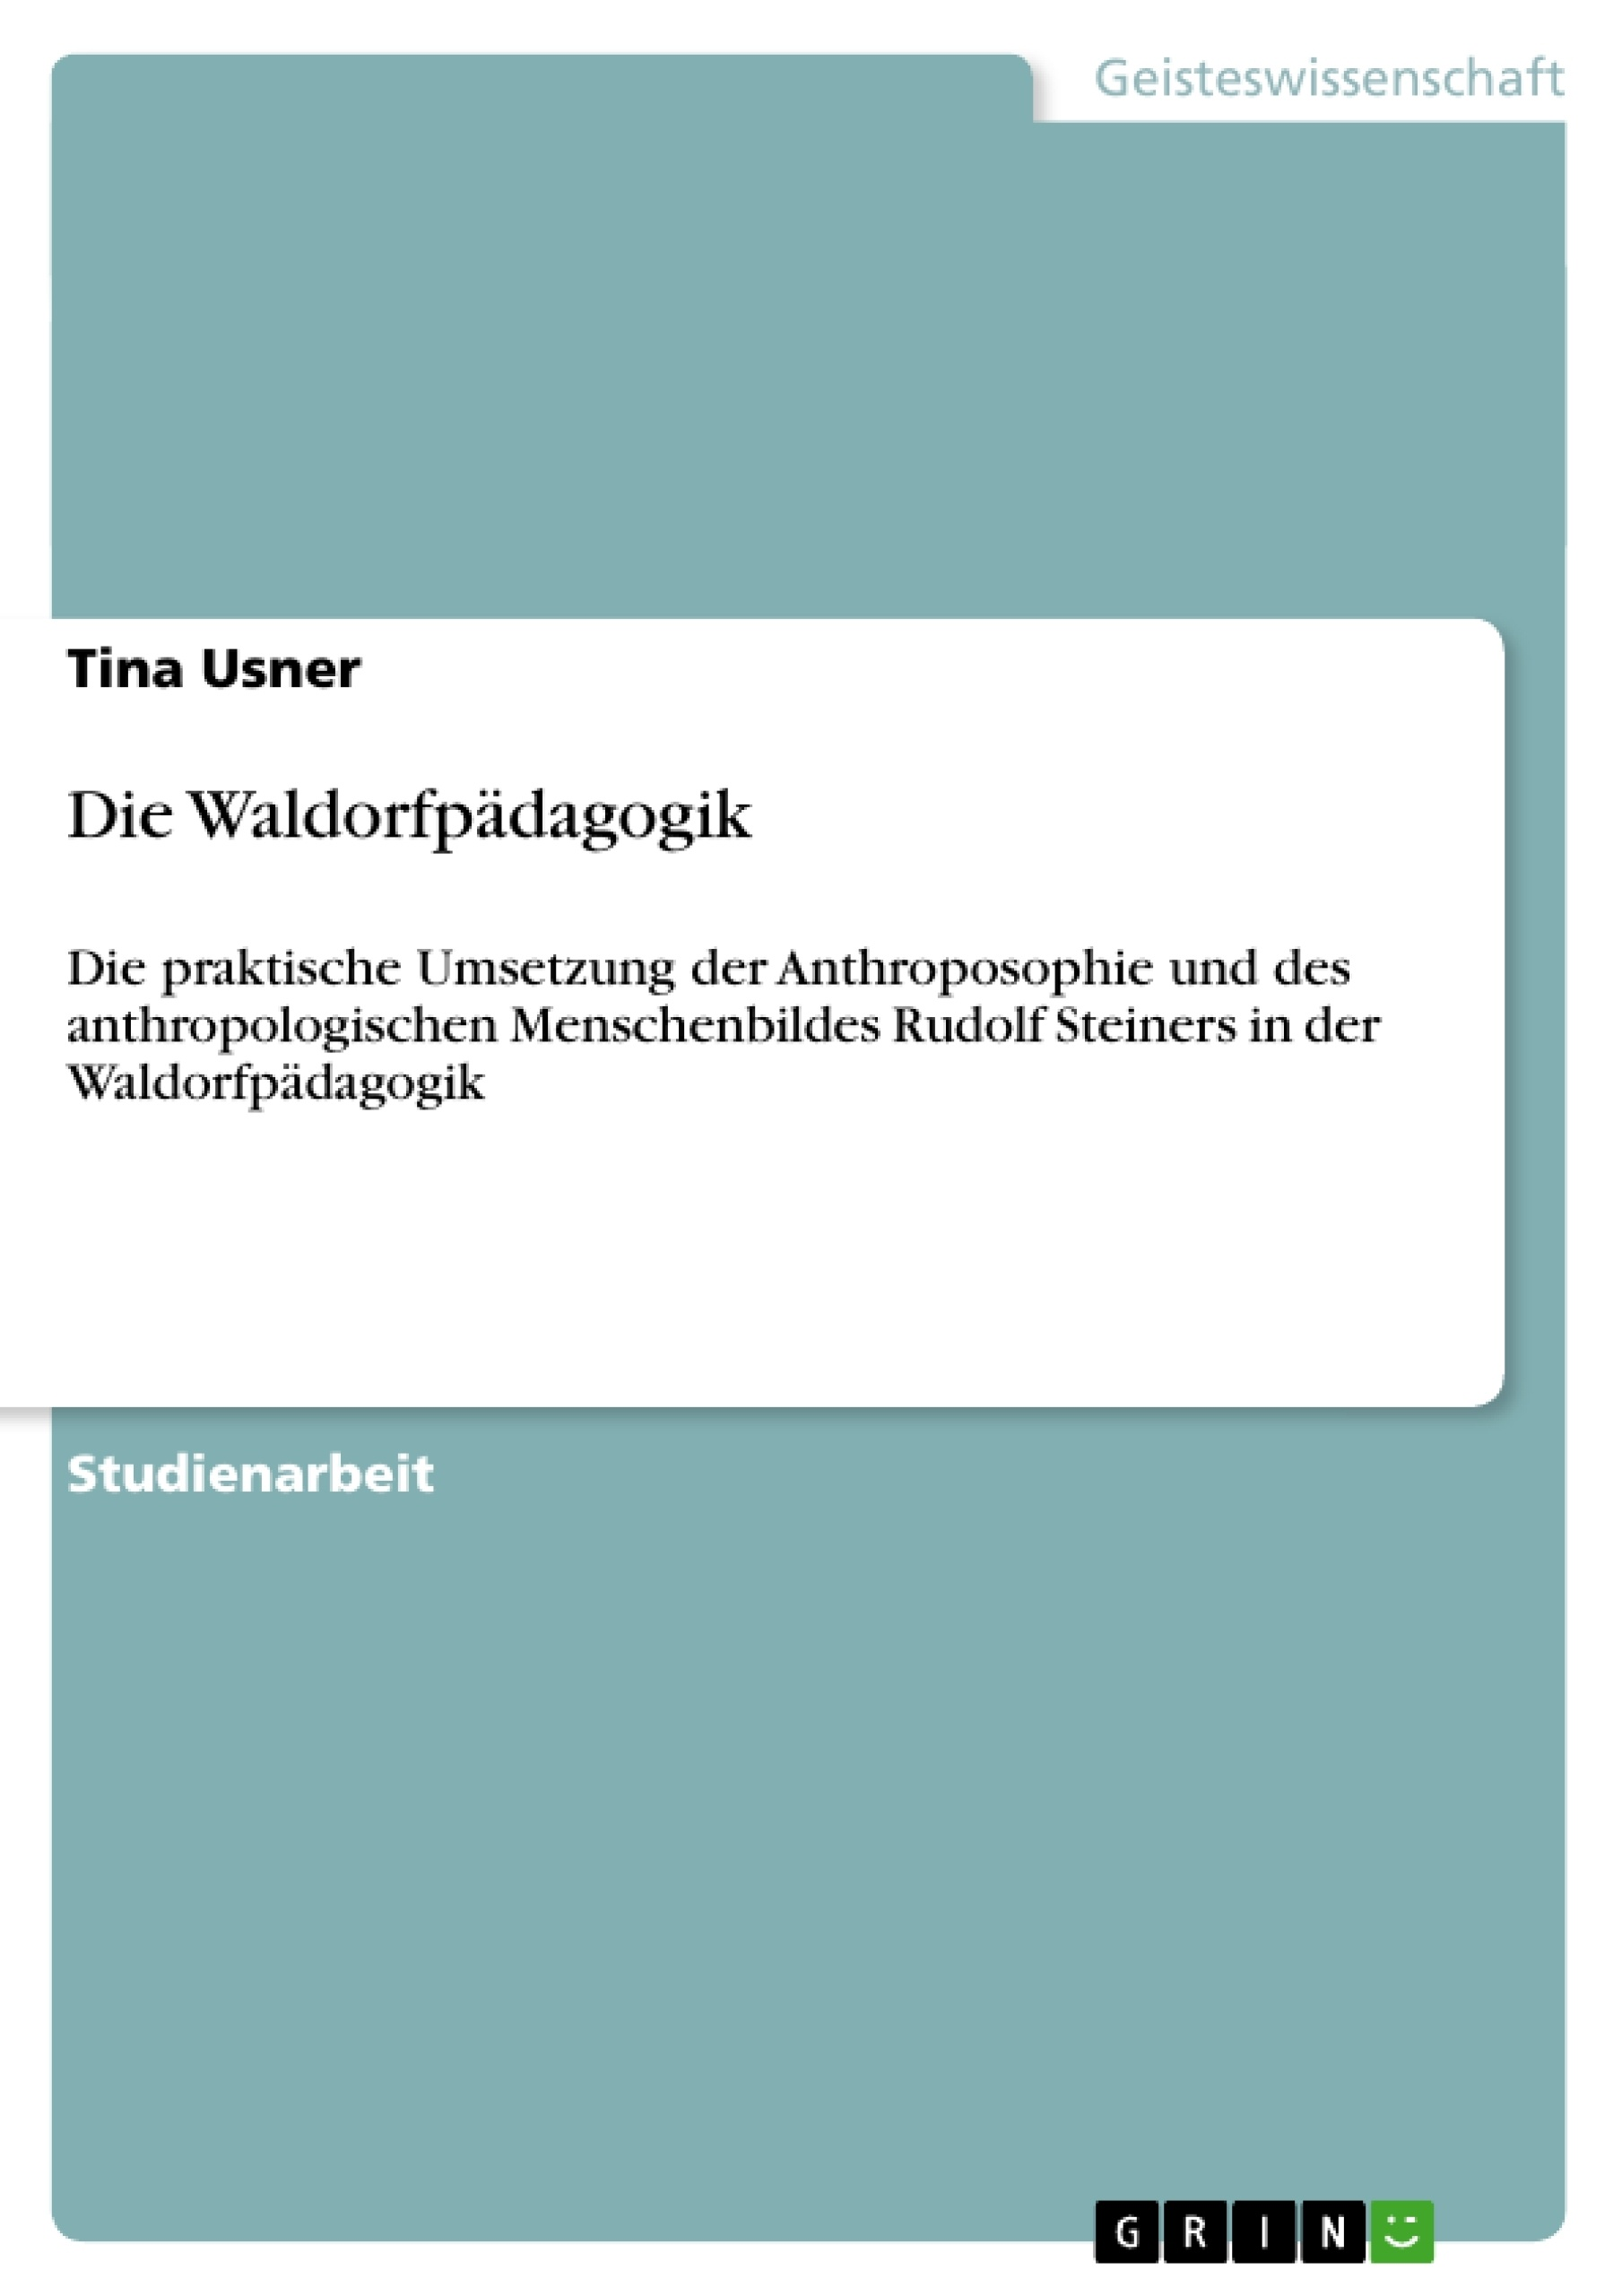 Titel: Die Waldorfpädagogik